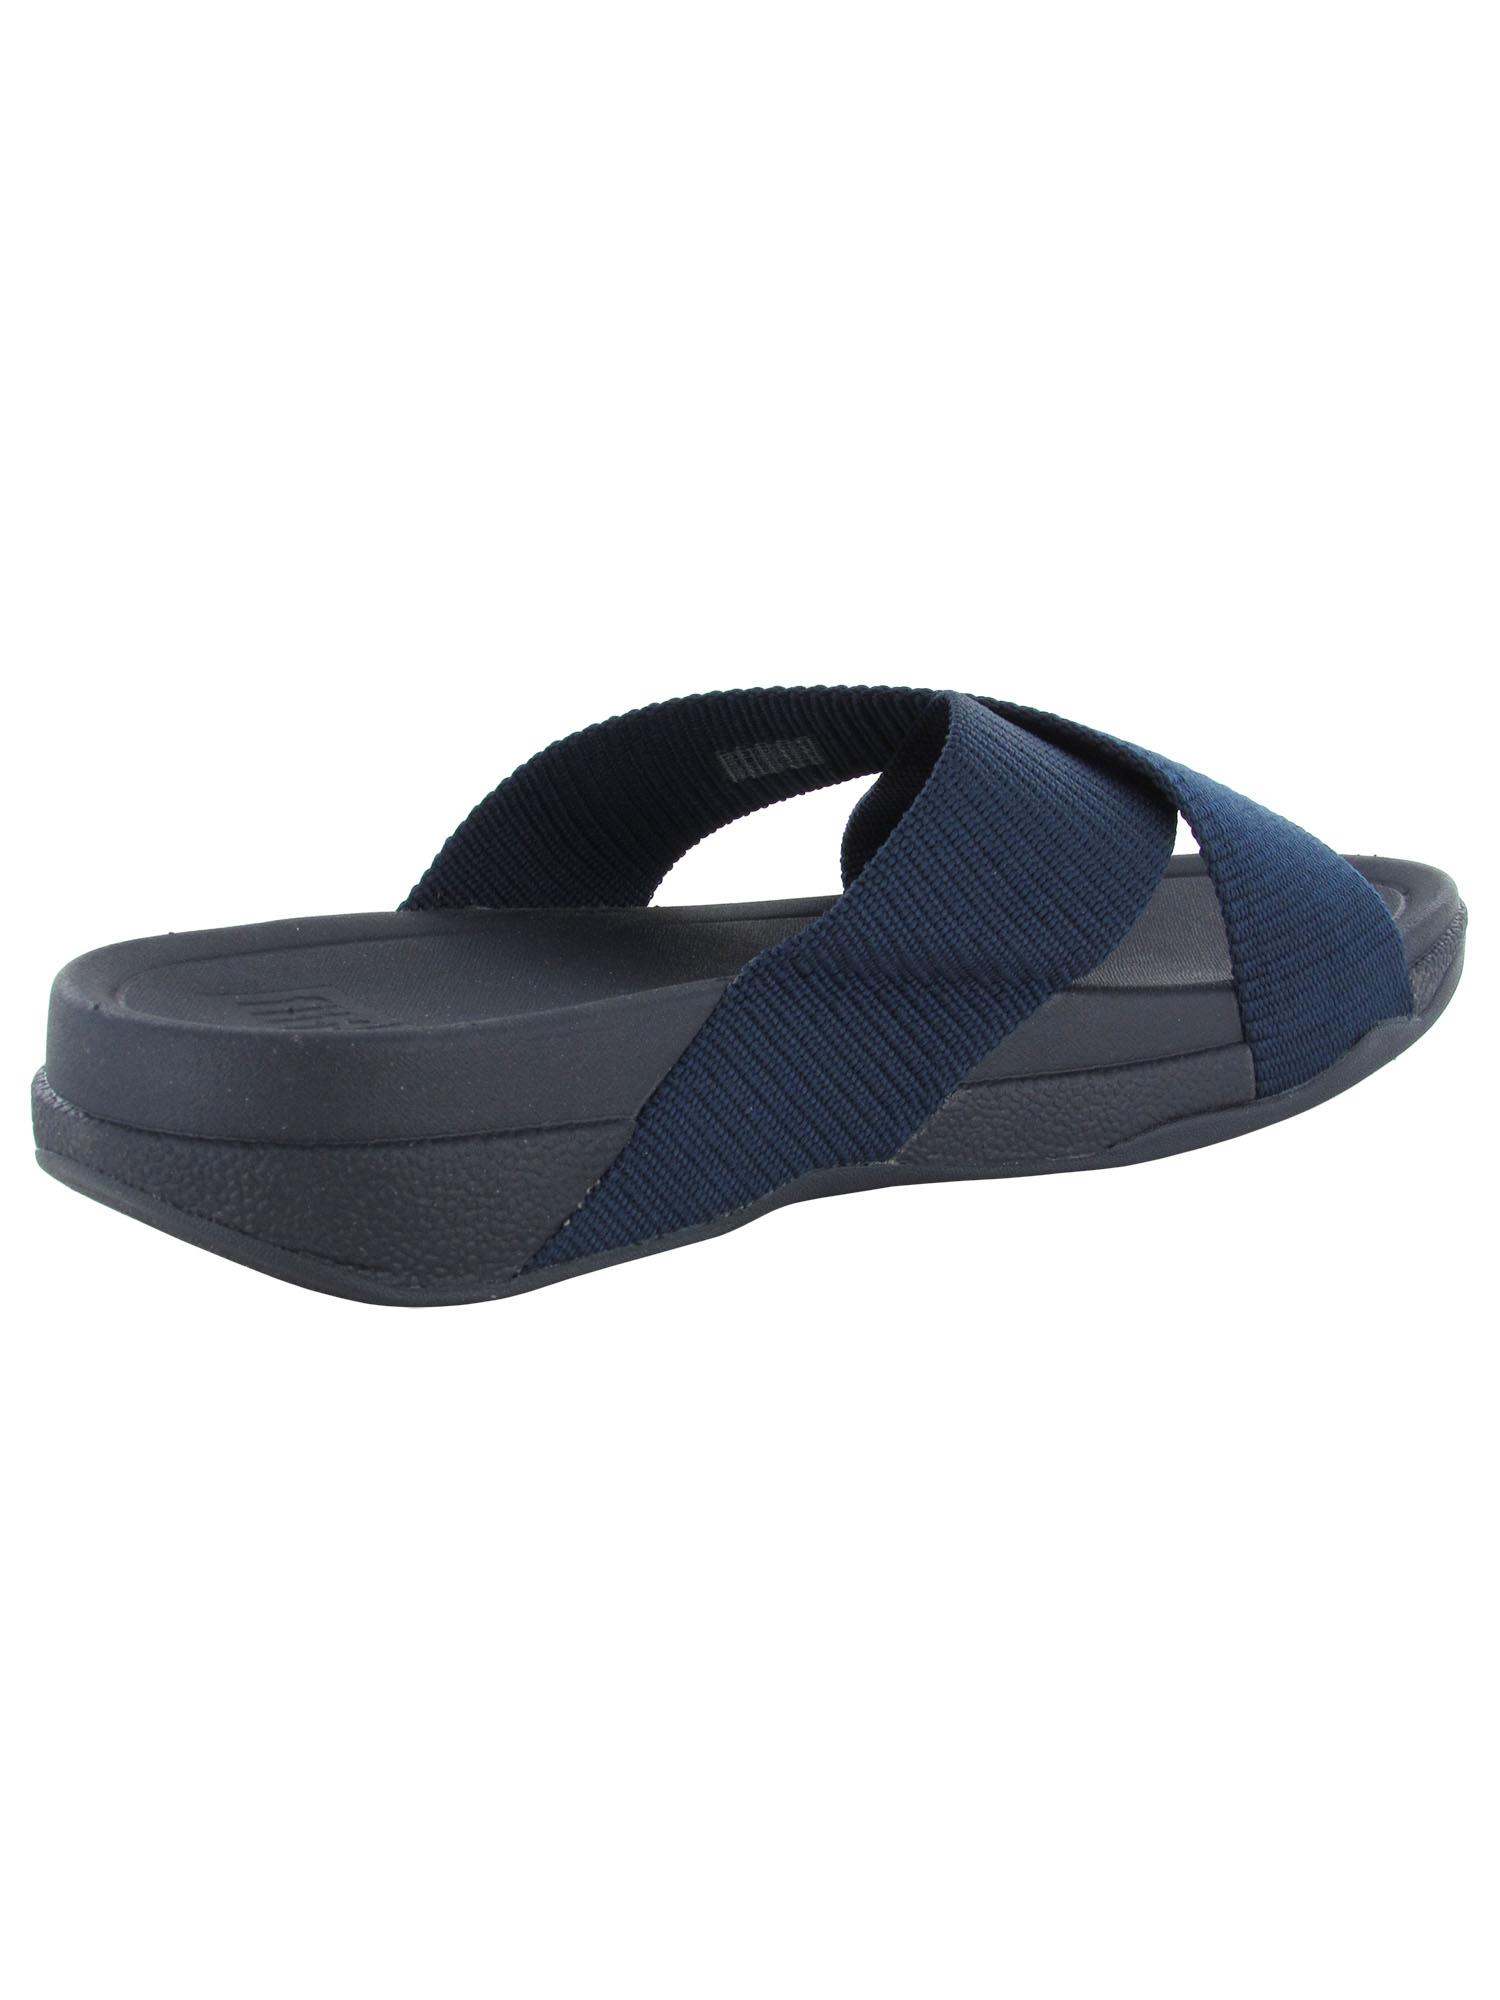 thumbnail 4 - Fitflop-Mens-Surfer-Slide-Cross-Strap-Sandal-Shoes